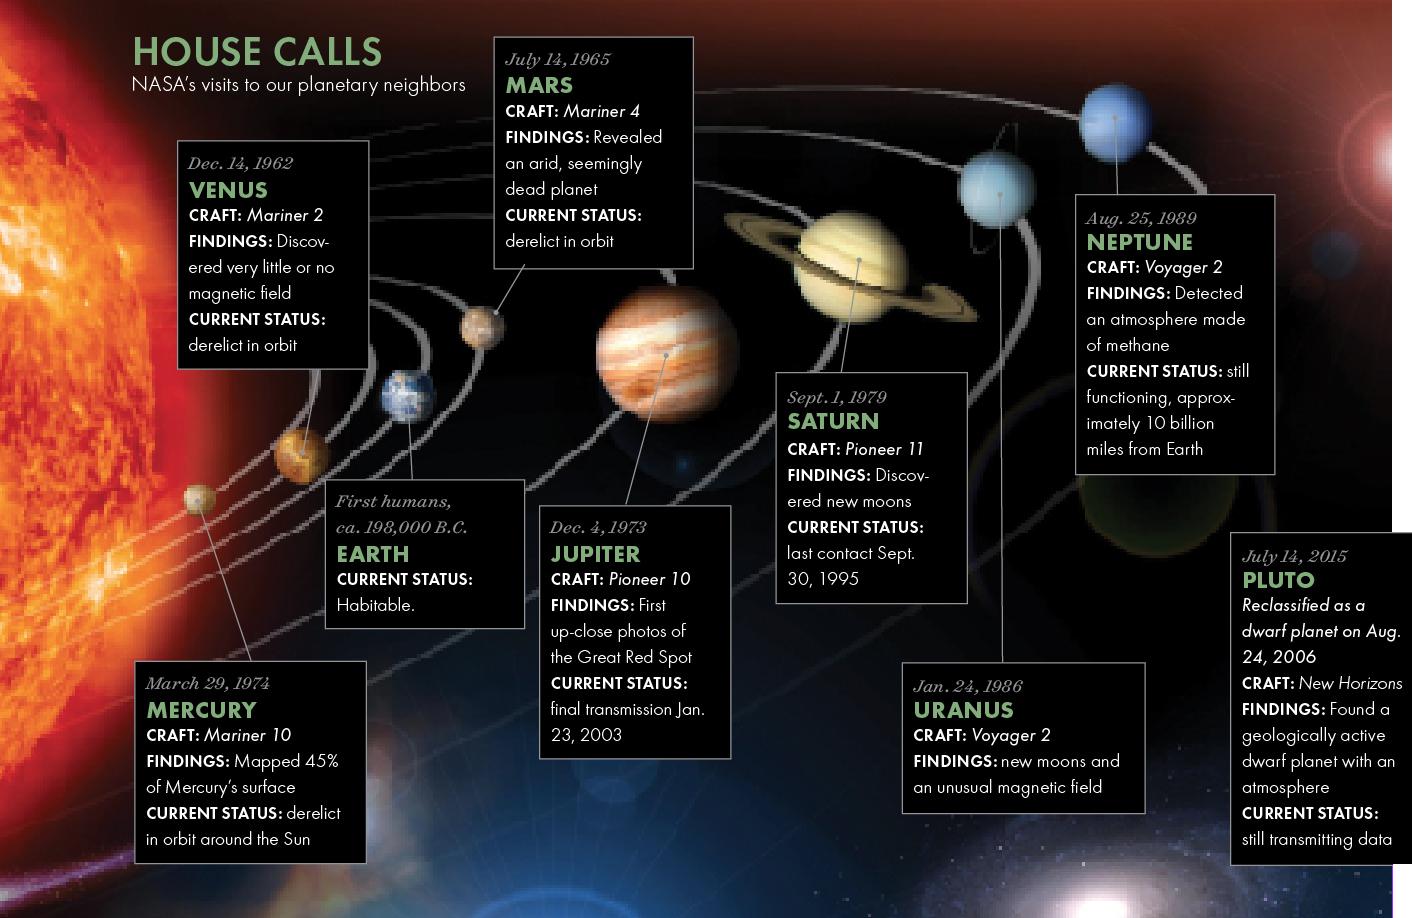 HOUSE CALLS: NASA's visits to our planetary neighbors